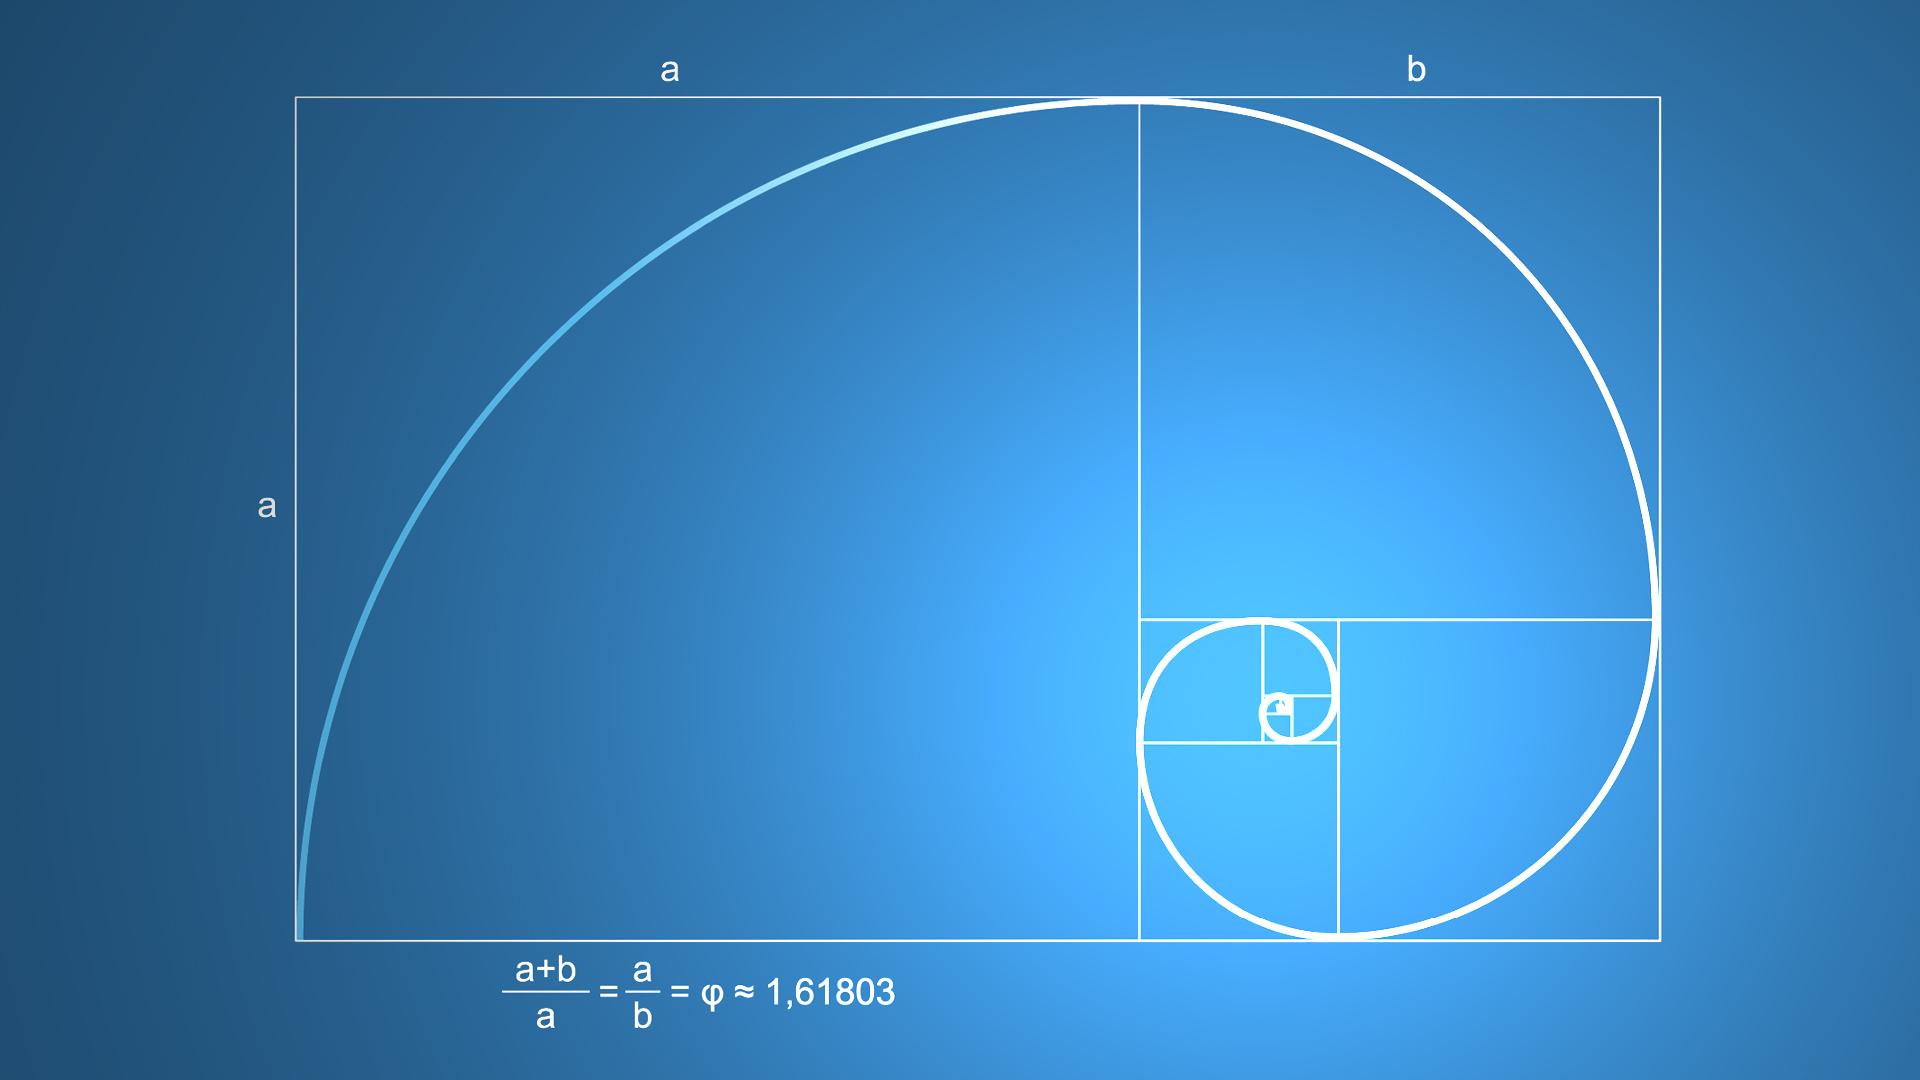 General 1920x1080 science pattern mathematics minimalism golden ratio golden ratio mathematics blue background square